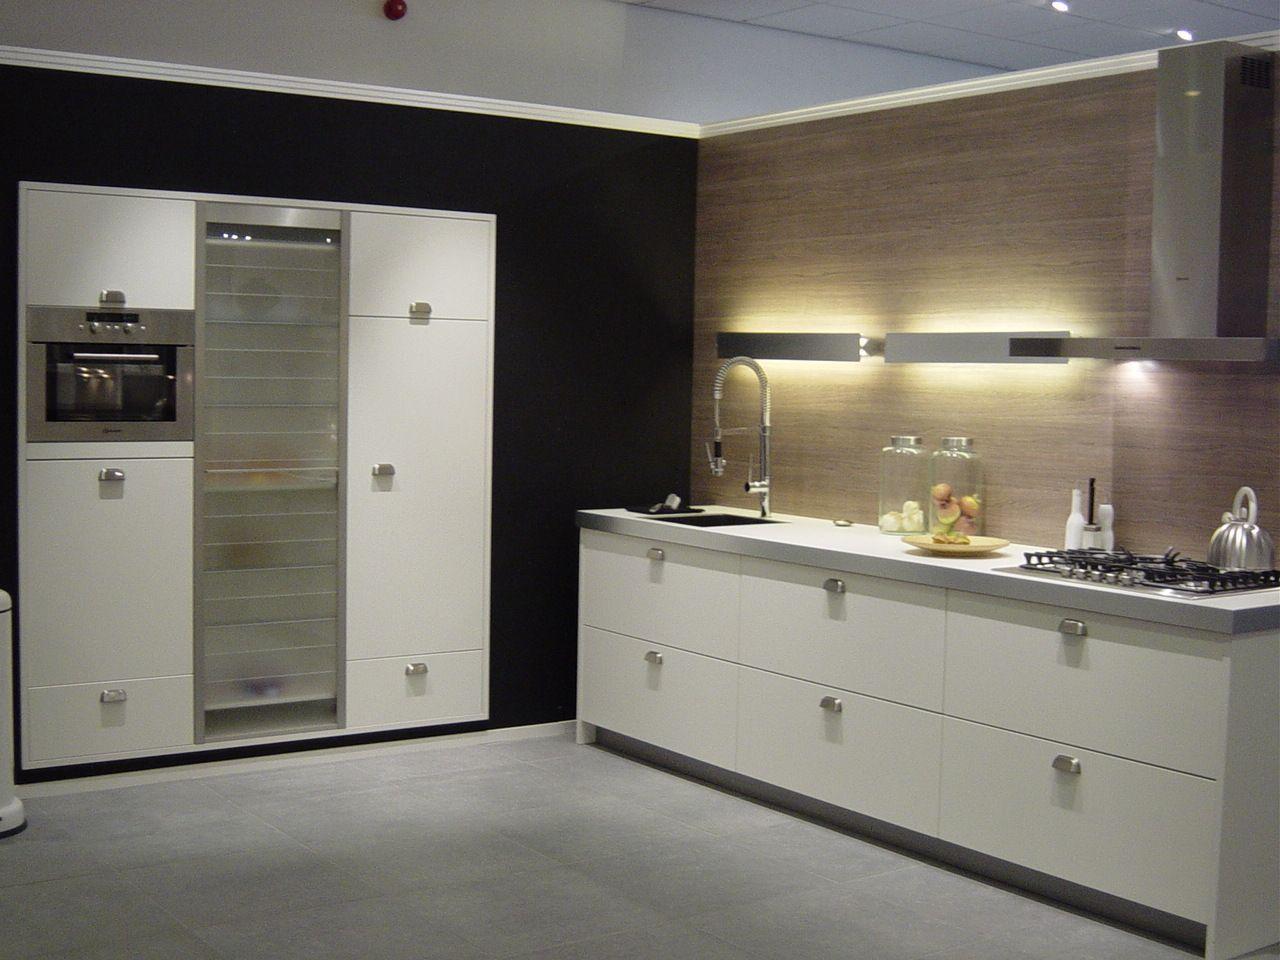 Grando Keukens Amsterdam : Showroomkeuken heerhugowaard milo grando keukens & bad